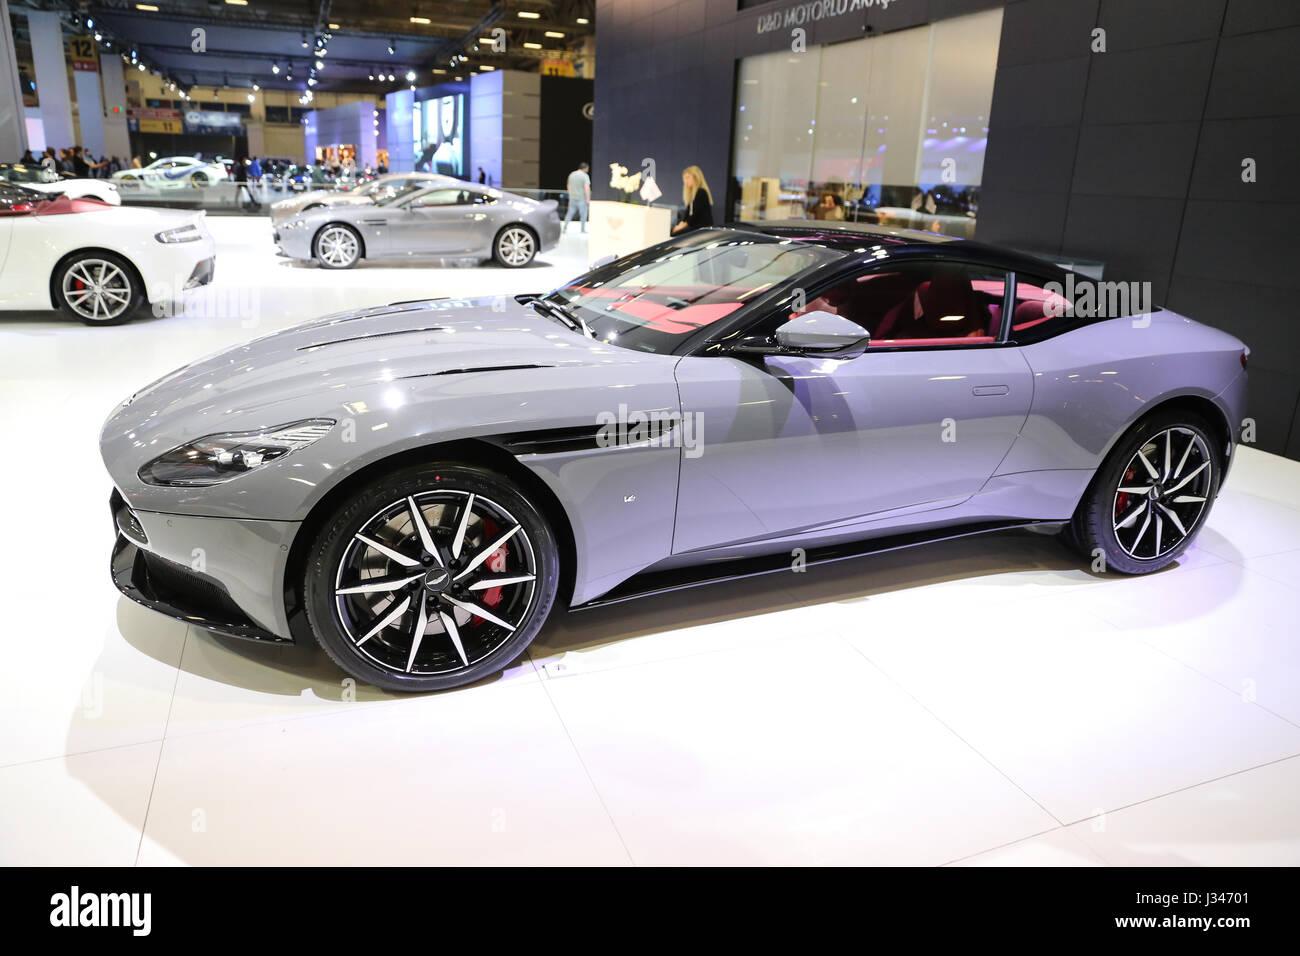 ISTANBUL, Türkei - 22. April 2017: Aston Martin DB11 Sackler Autoshow Istanbul Stockbild